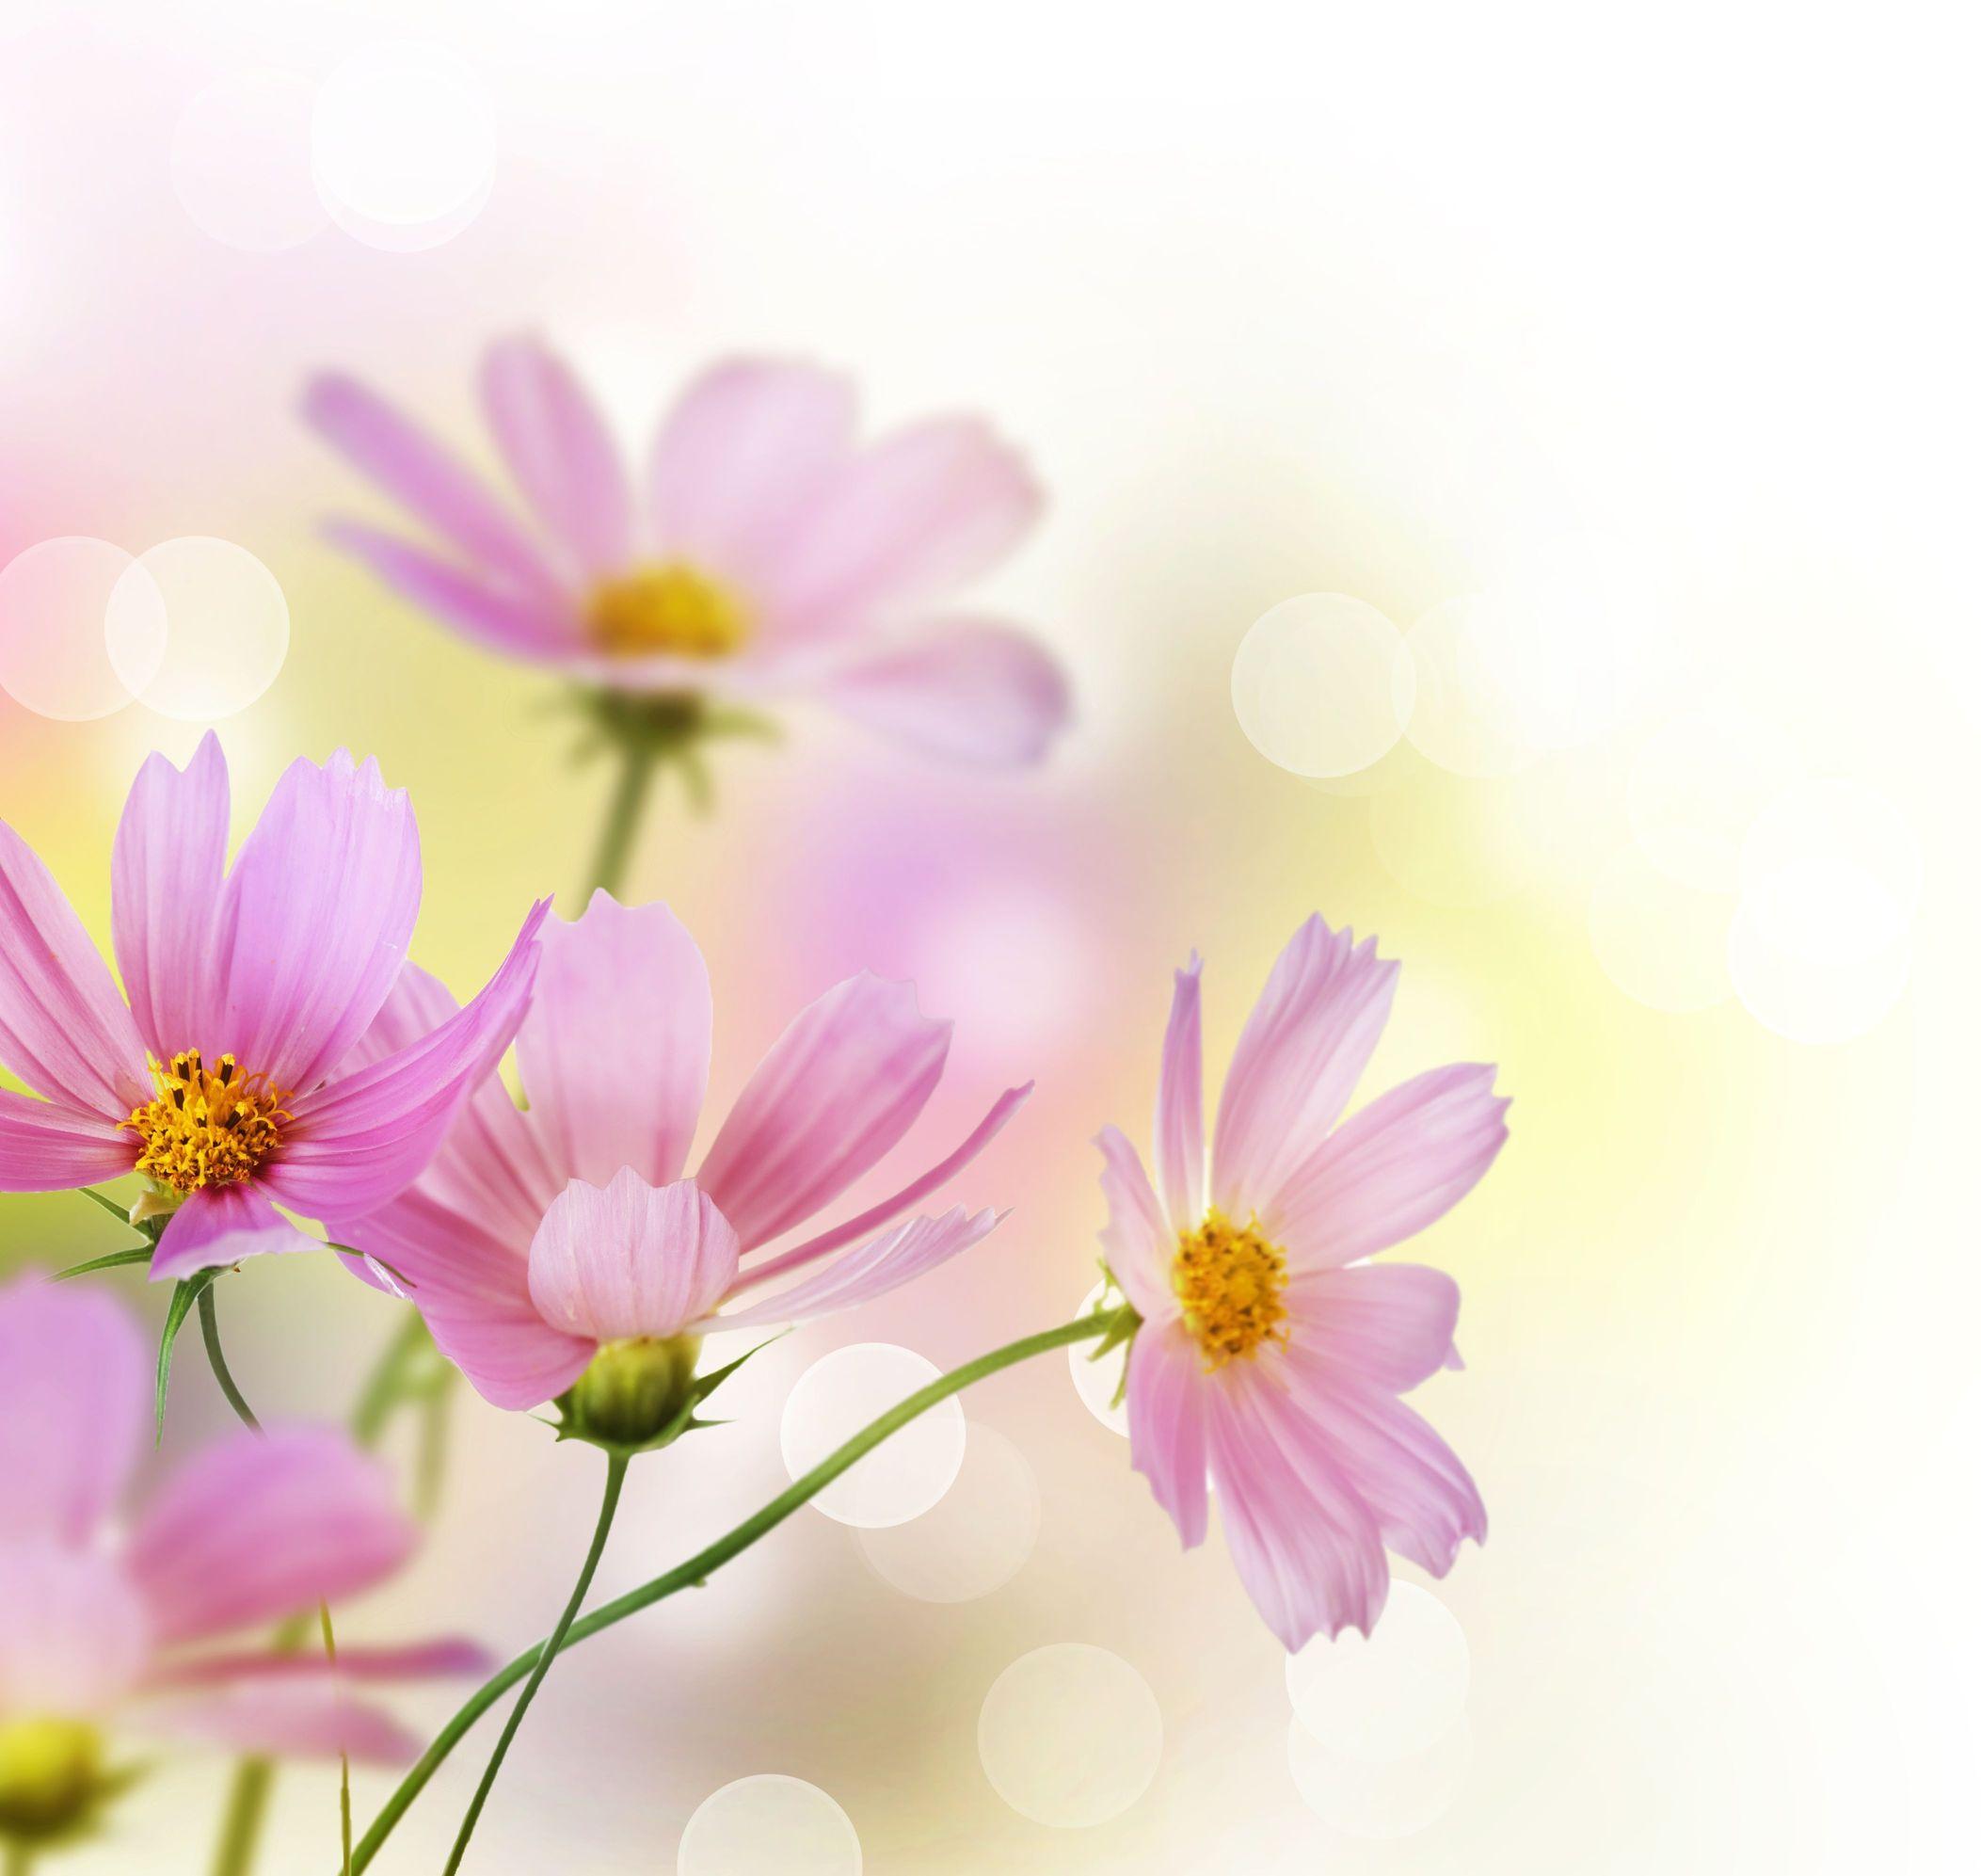 Flower Wallpaper App For Android